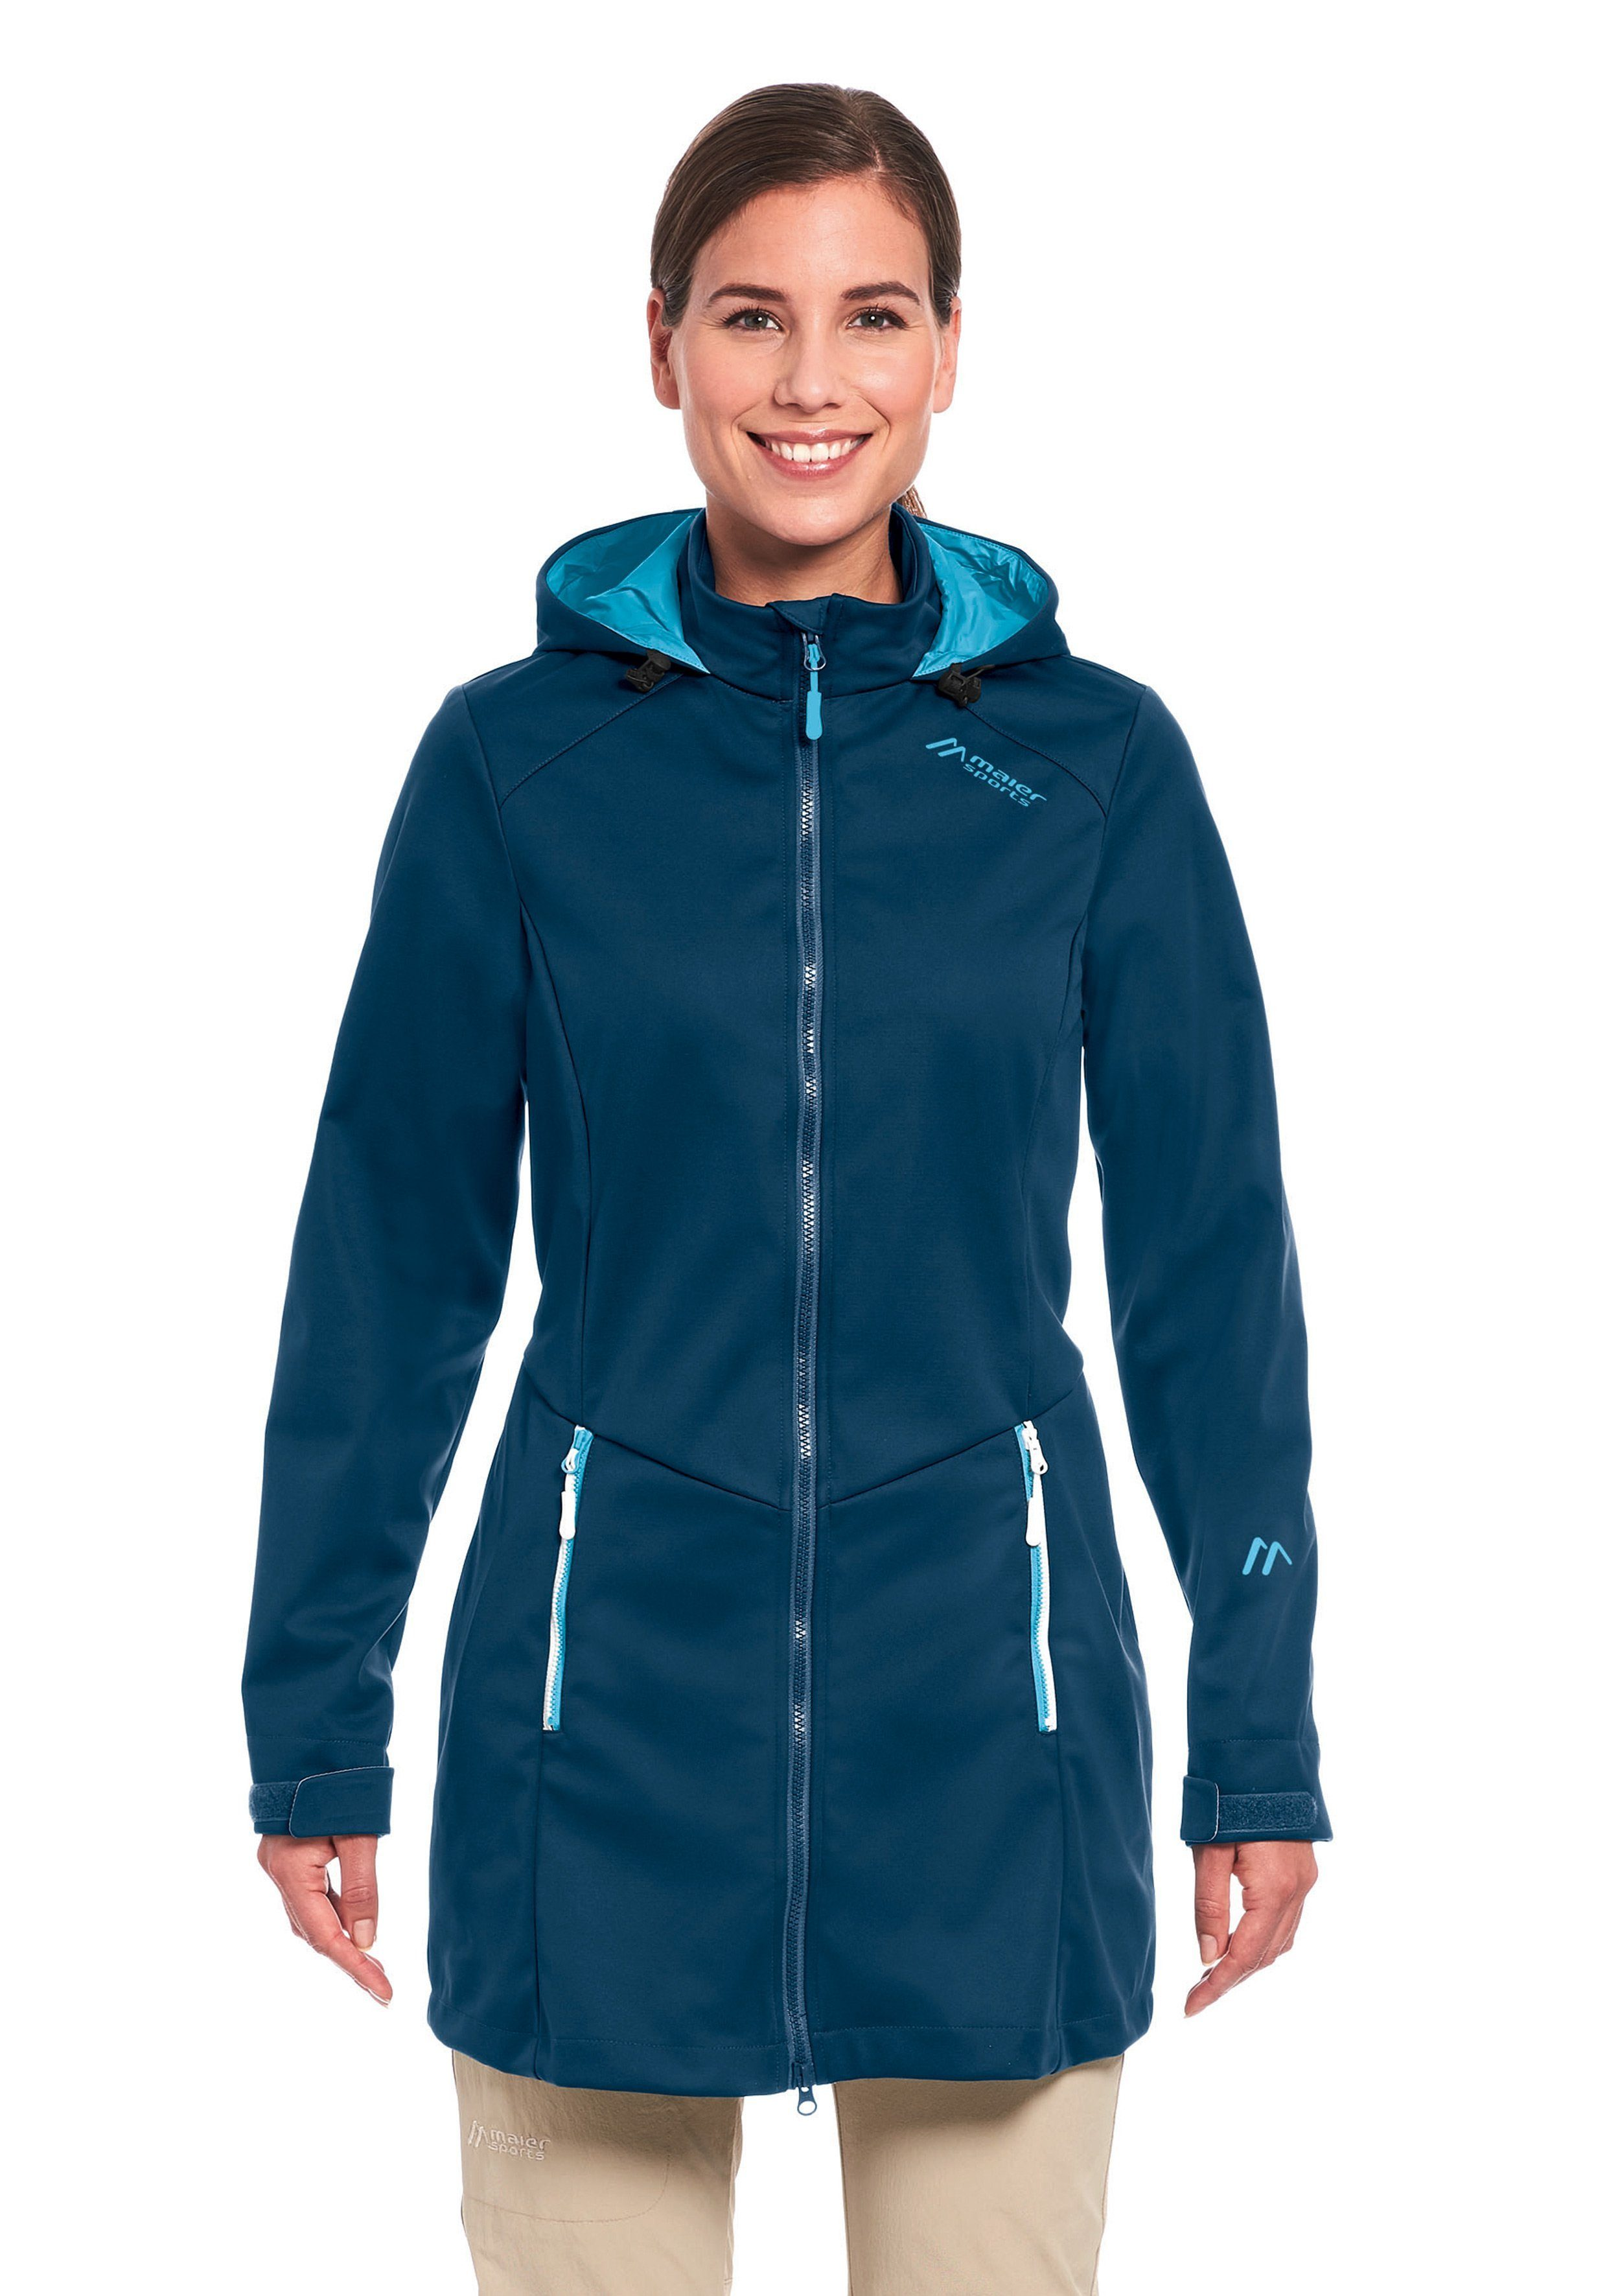 Maier Sports Softshellmantel Samum Coat W   Sportbekleidung > Sportmäntel > Softshellmäntel   Blau   maier sports